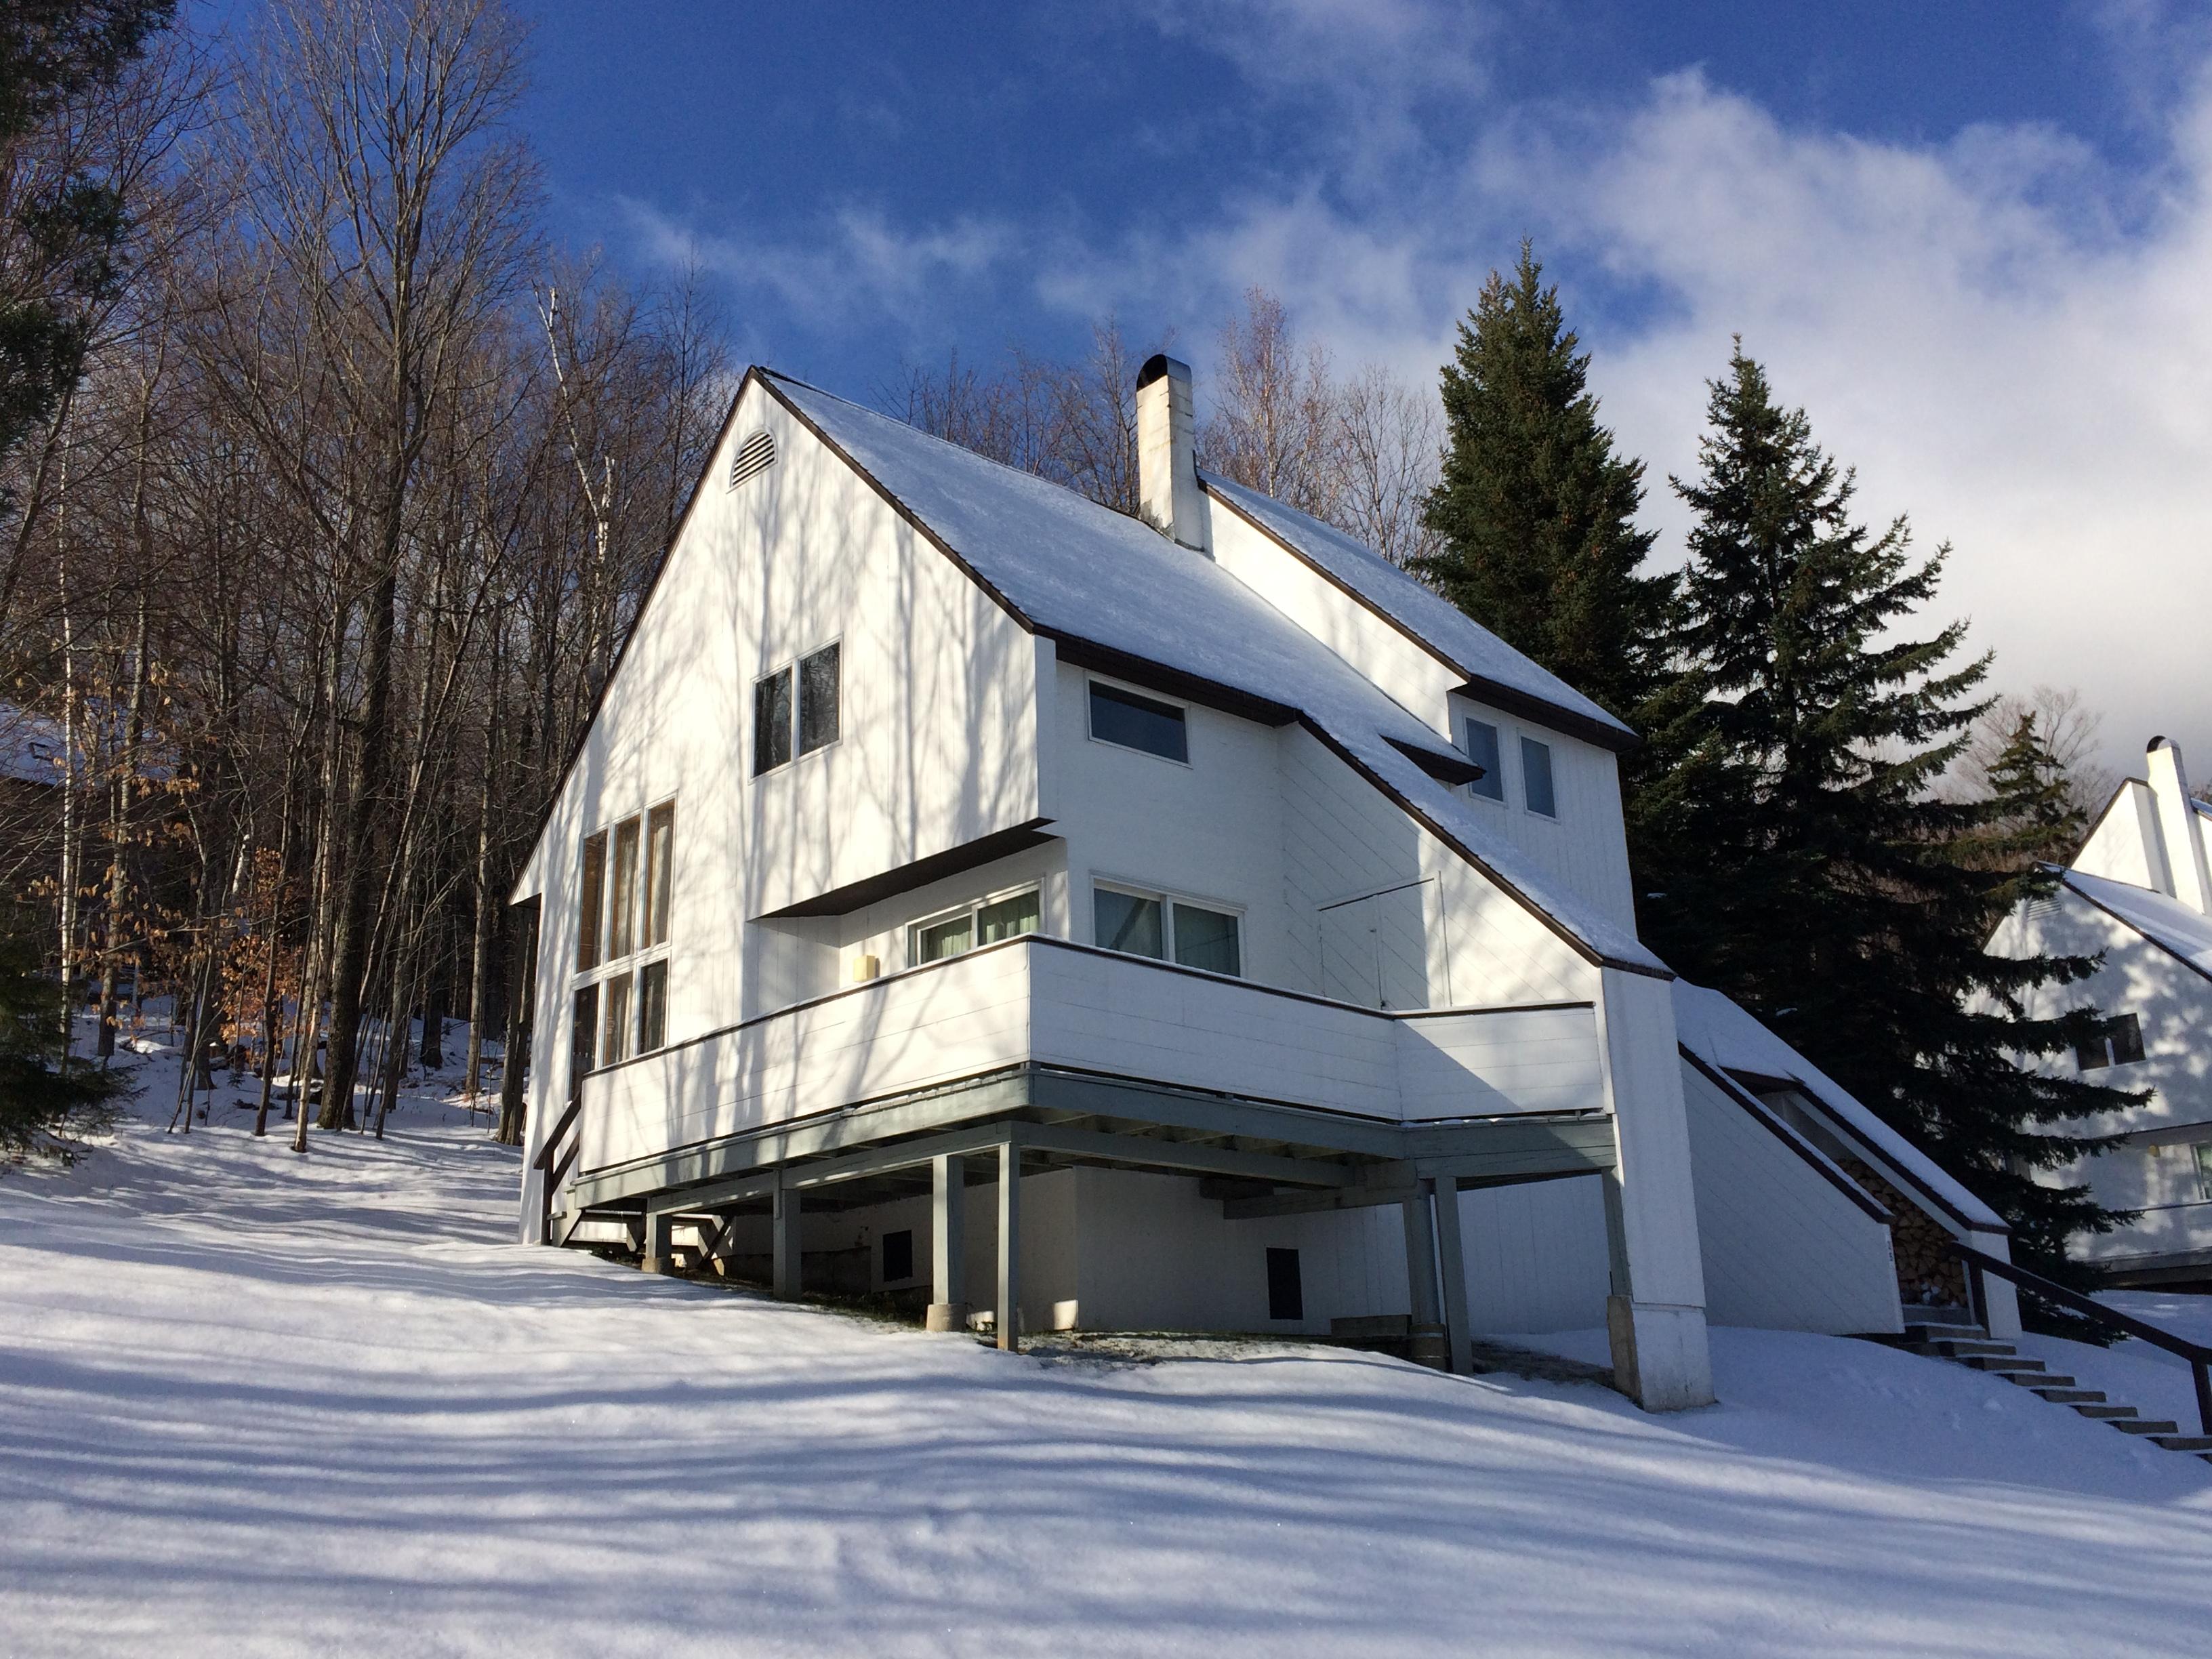 Vermont Ski Homes Condos Maple Sweet Real Estate